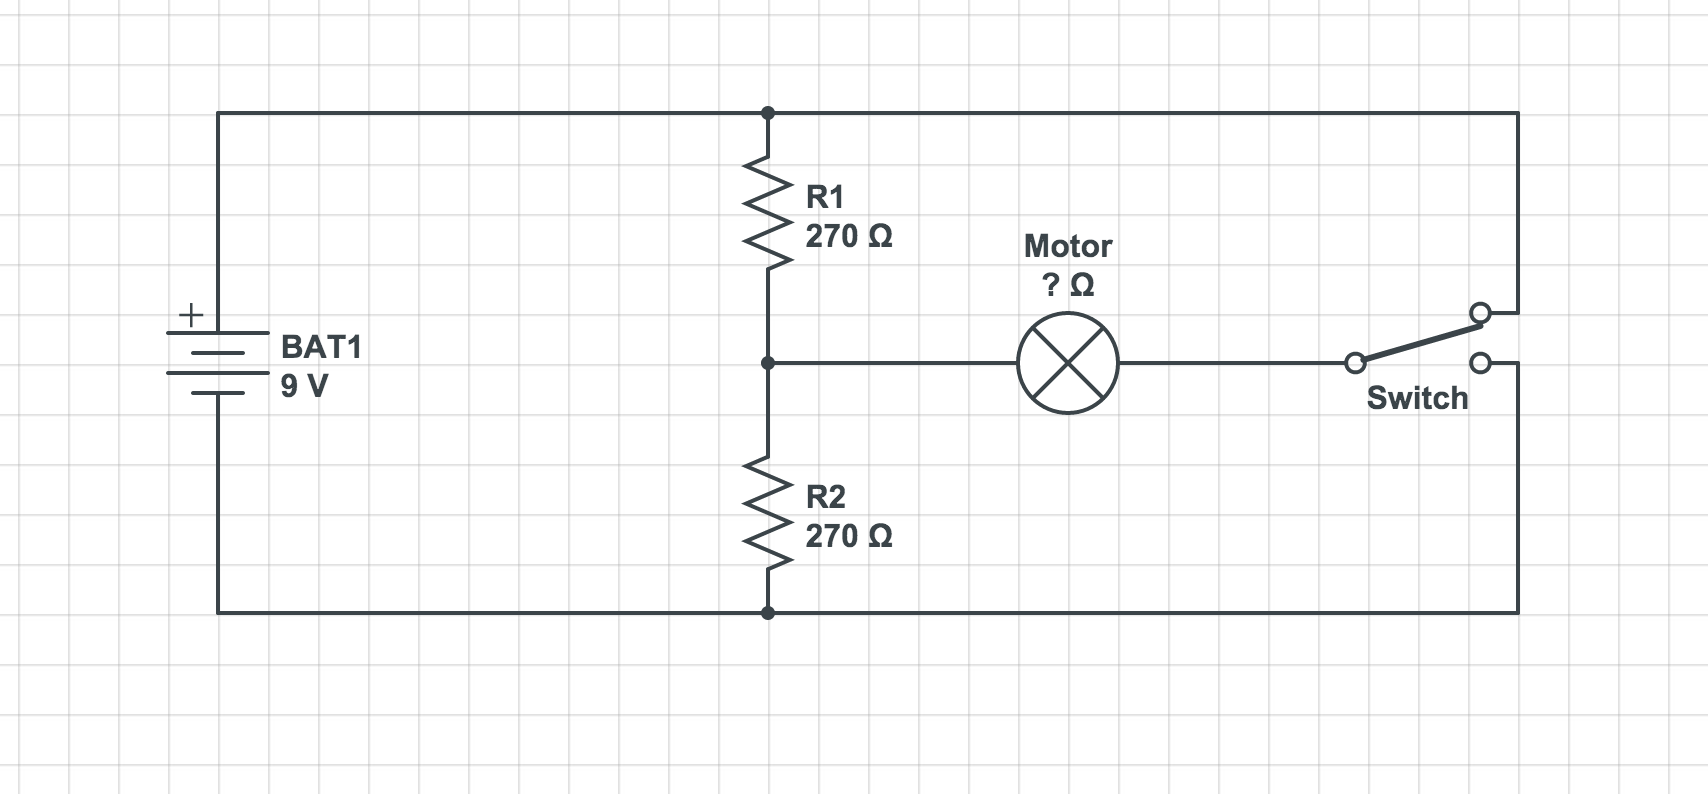 SD_0913 Wiring Diagram 12 Wire Motor Download Diagram [ 794 x 1708 Pixel ]